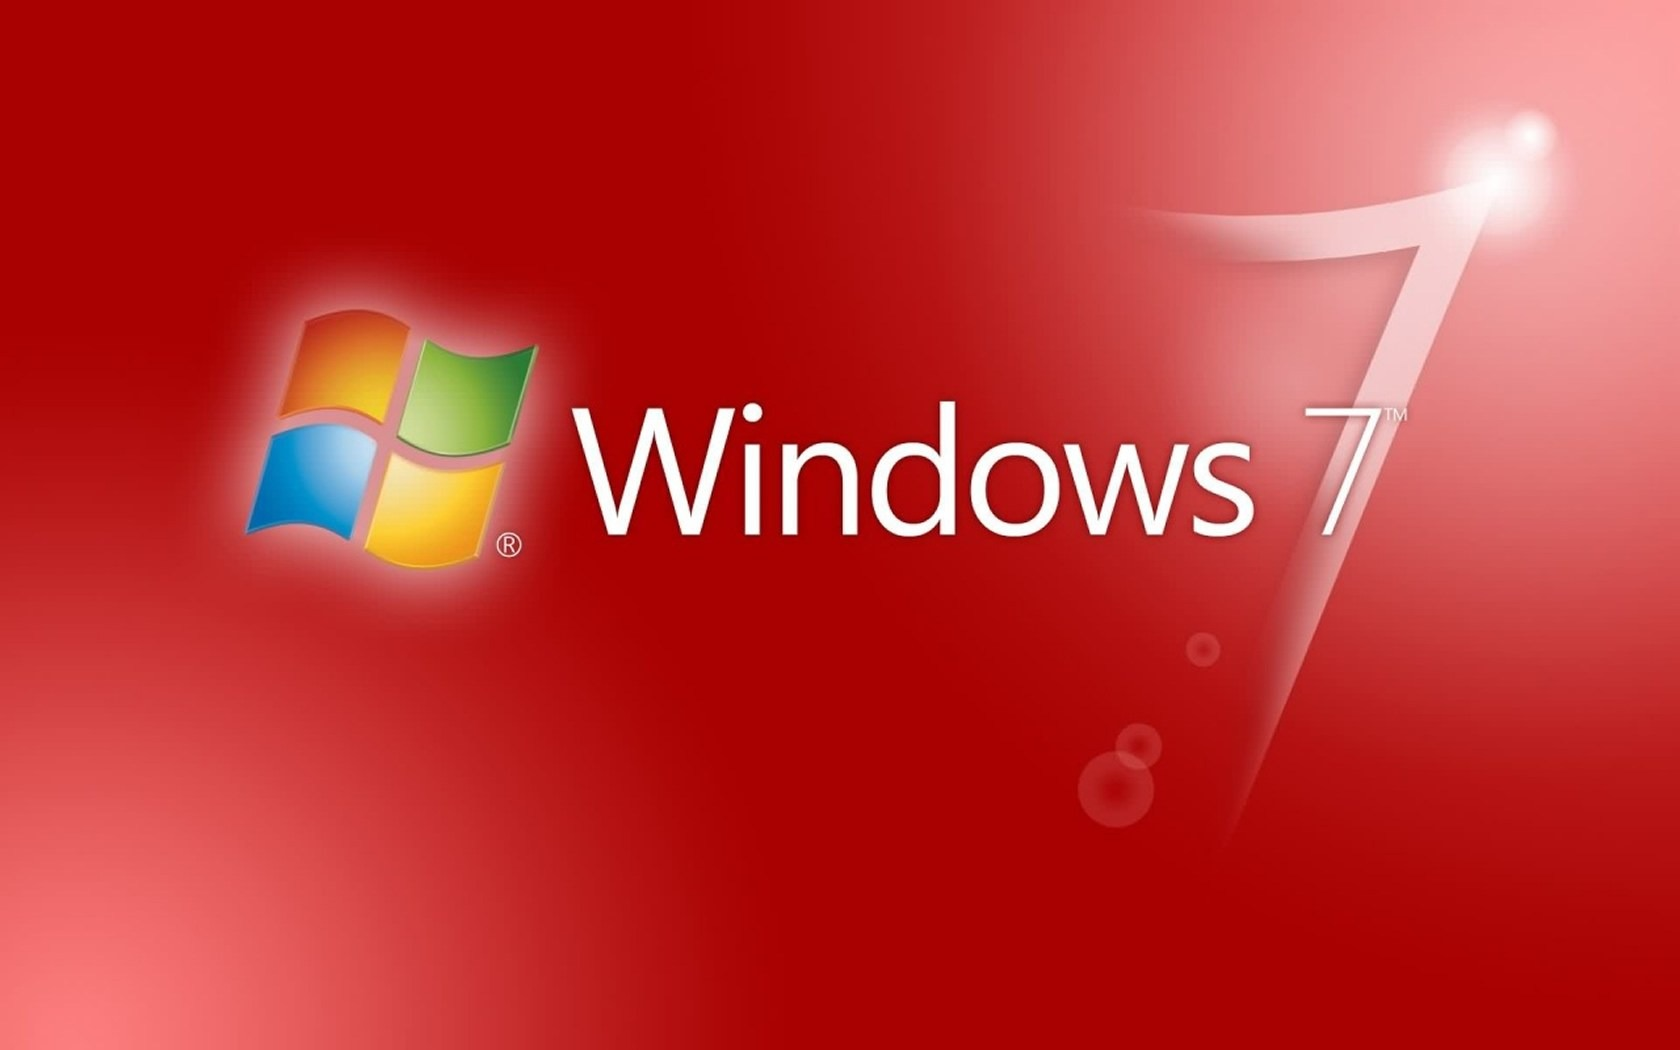 /var/www/html/wp-content/uploads/2018/10/windows-7-red